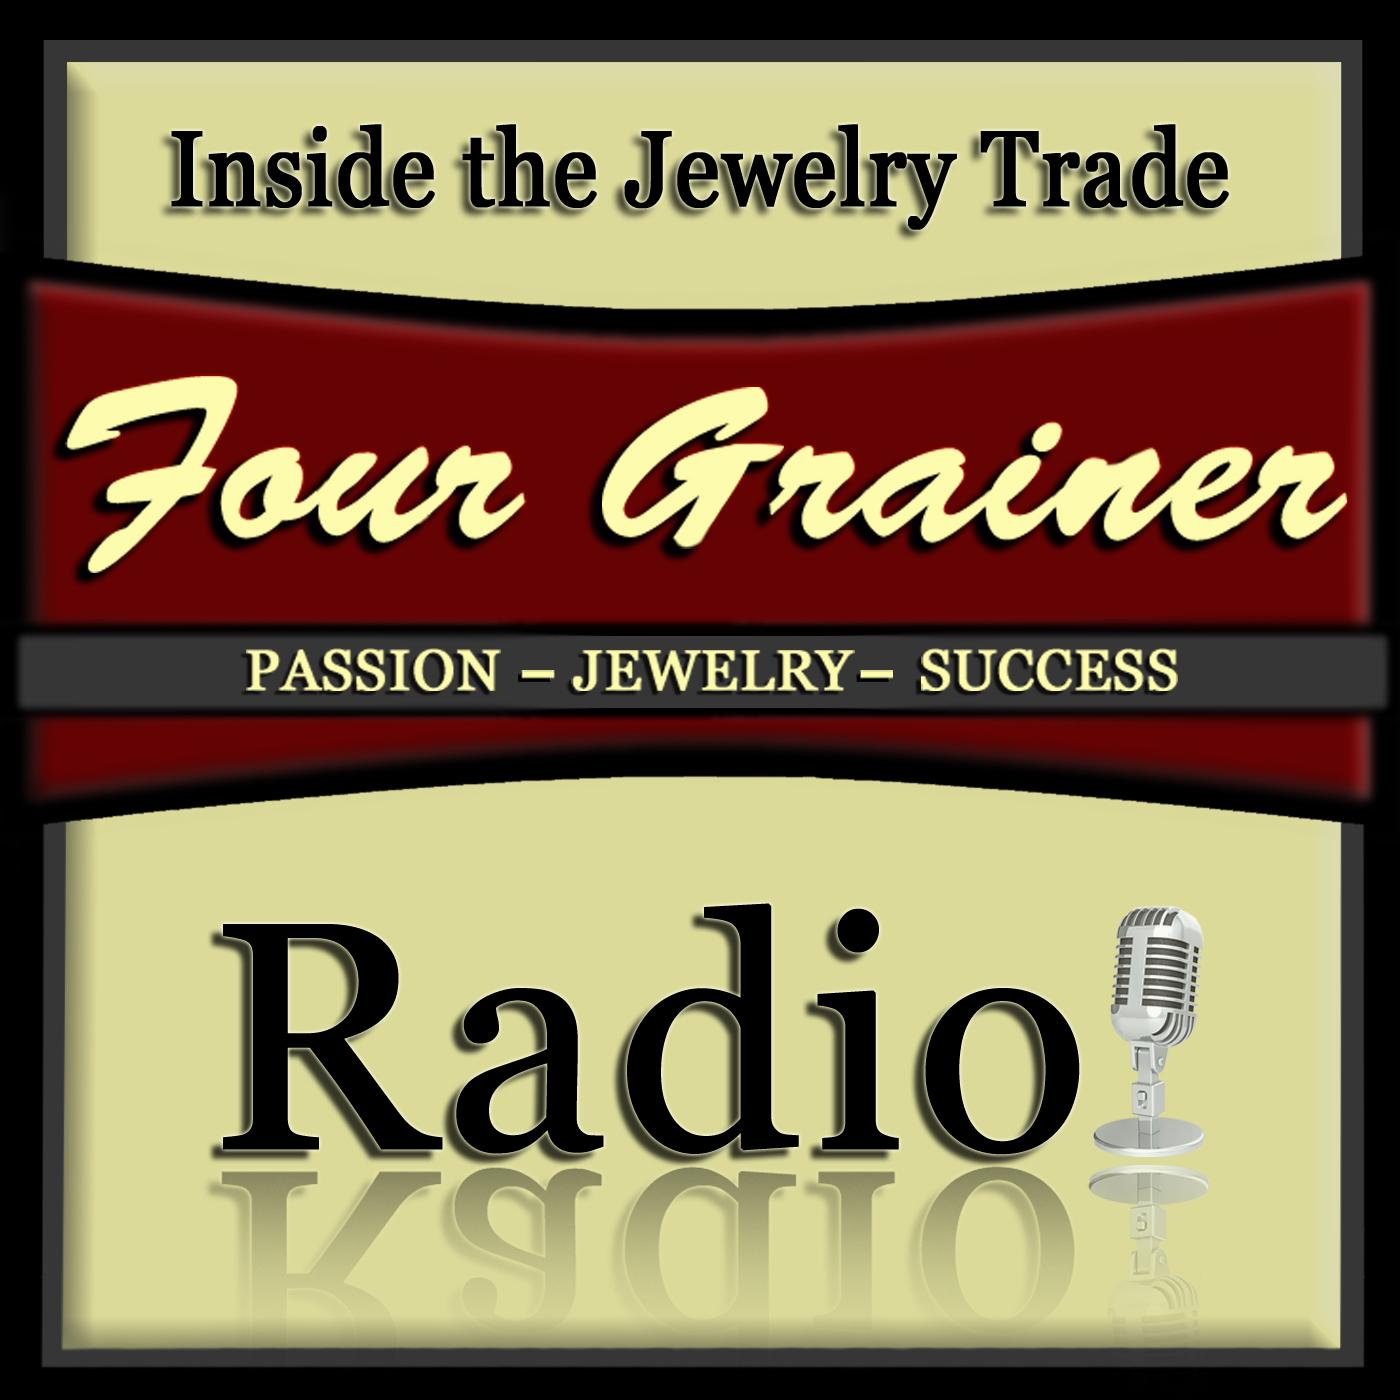 Inside the Jewelry Trade Radio Show logo